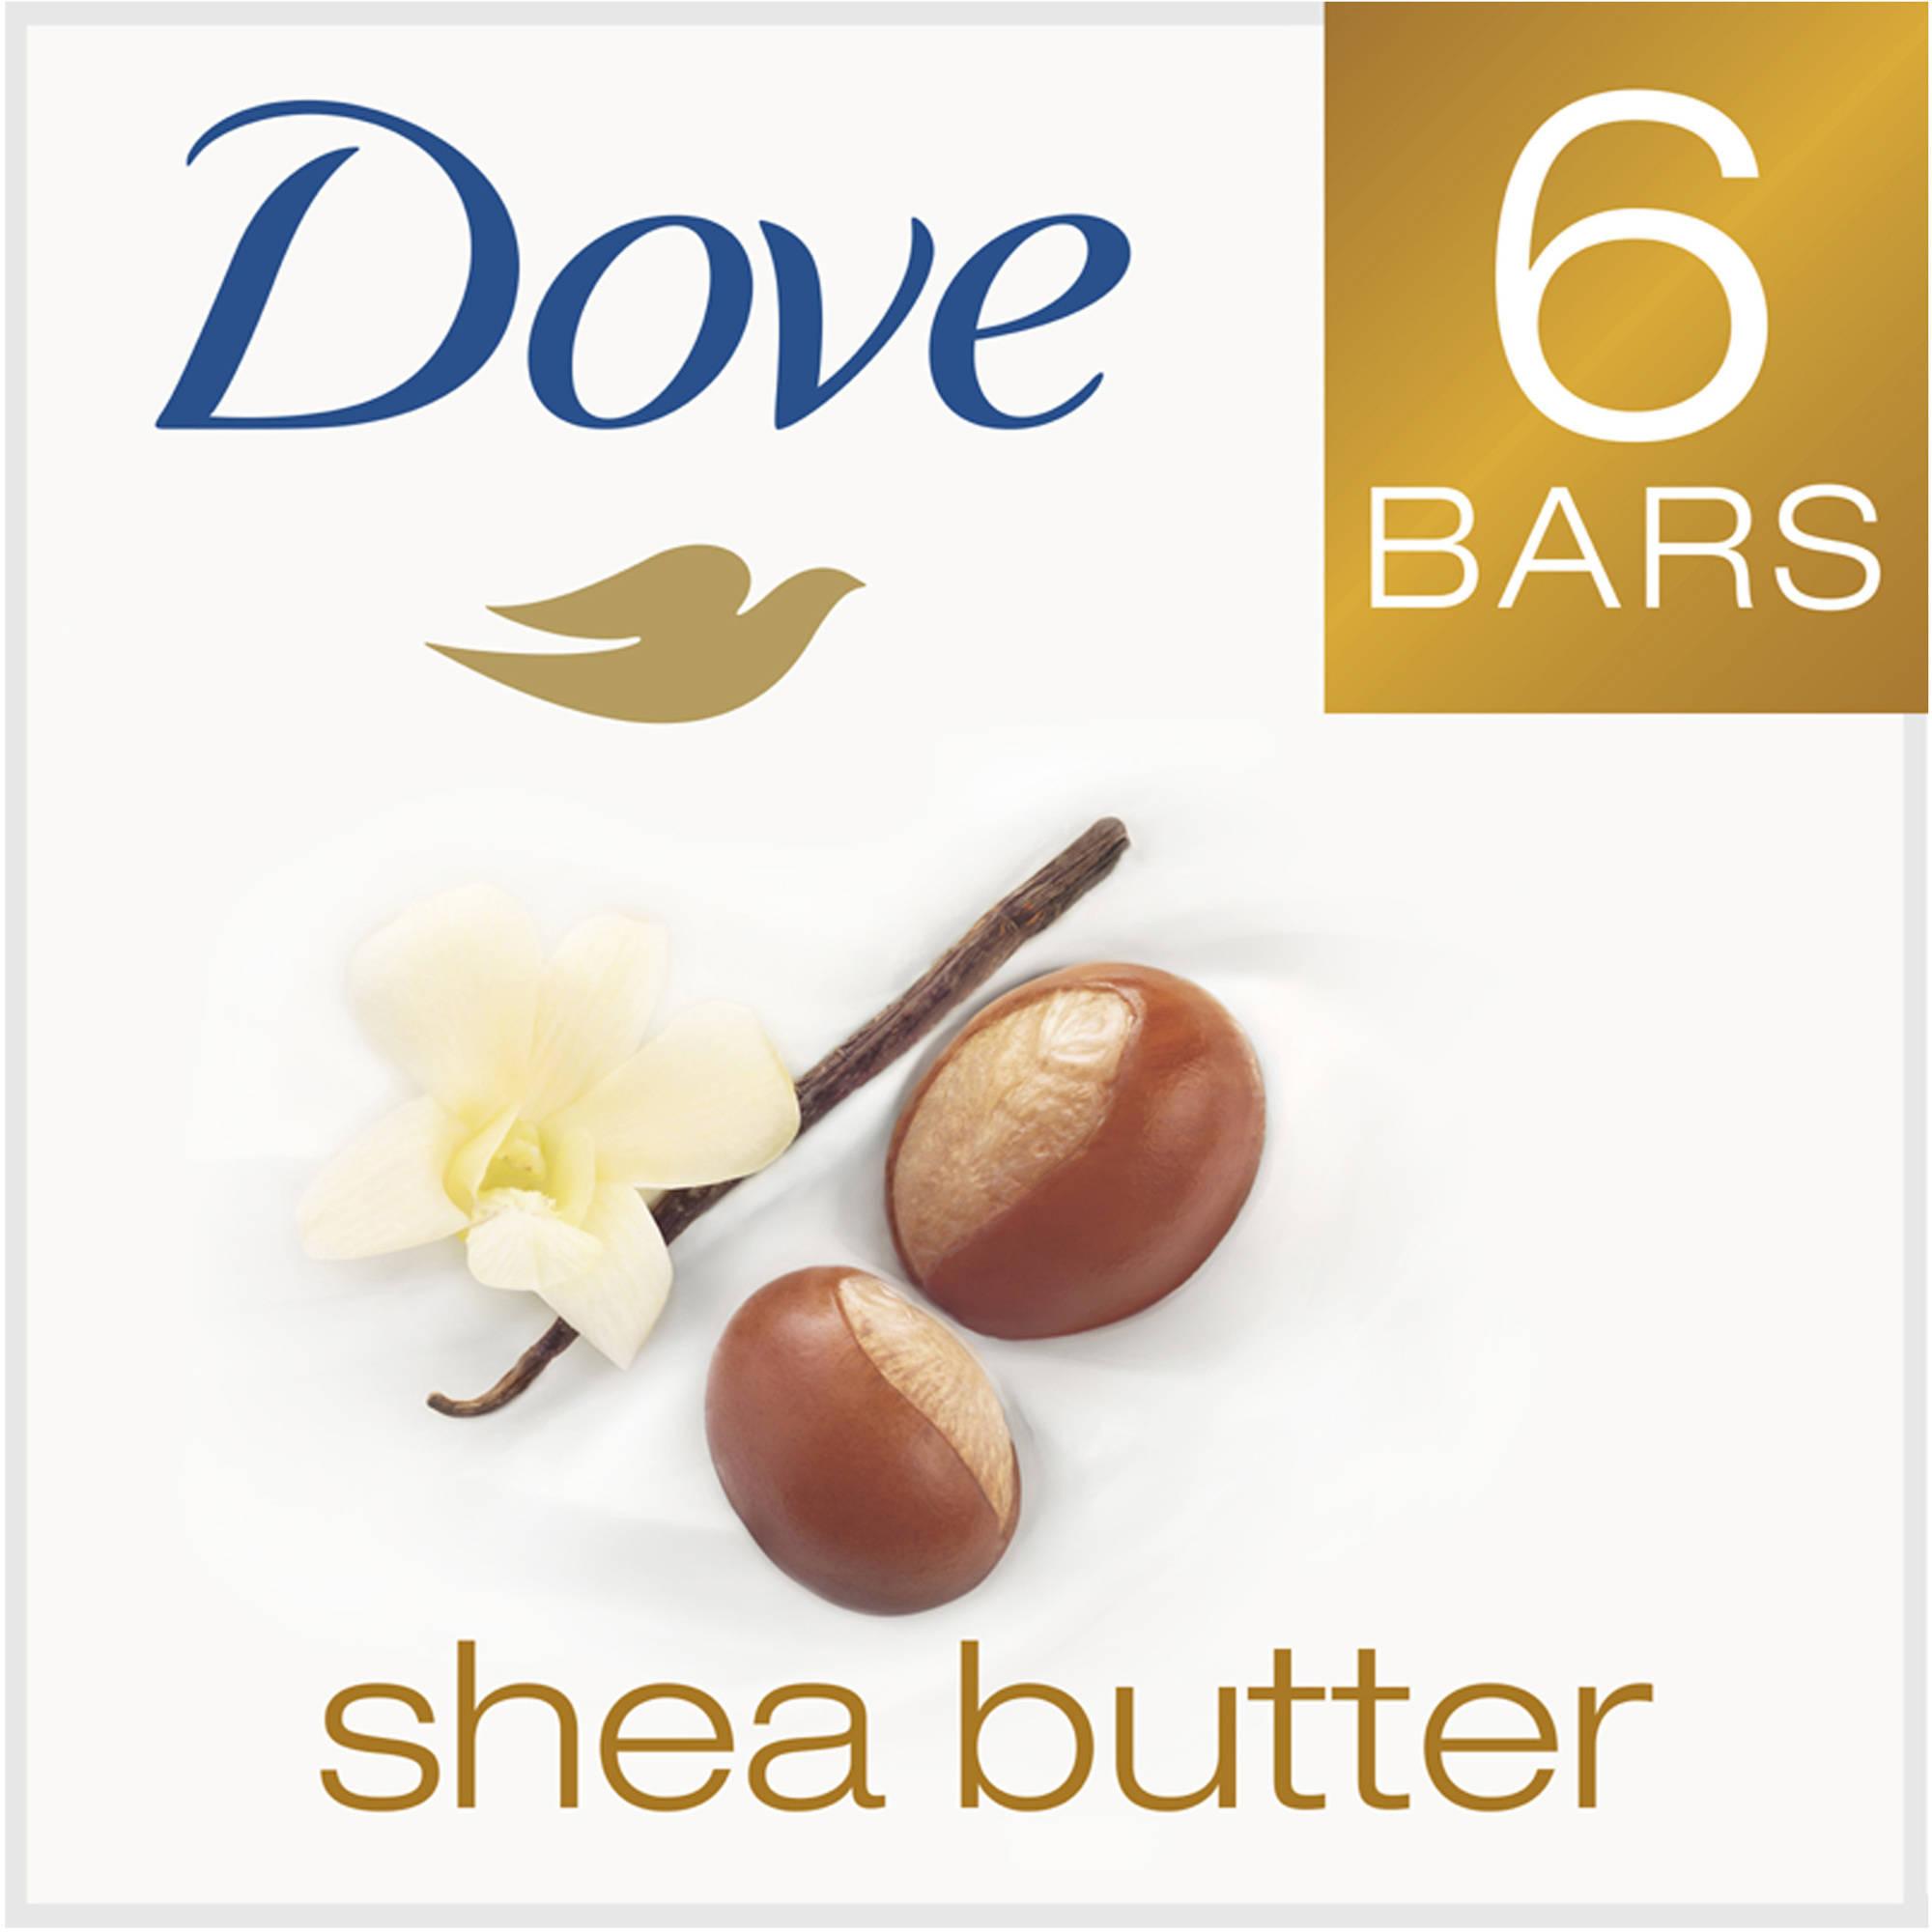 Purely Pampering Shea Butter Beauty Bar, 4 oz, 6 Bar